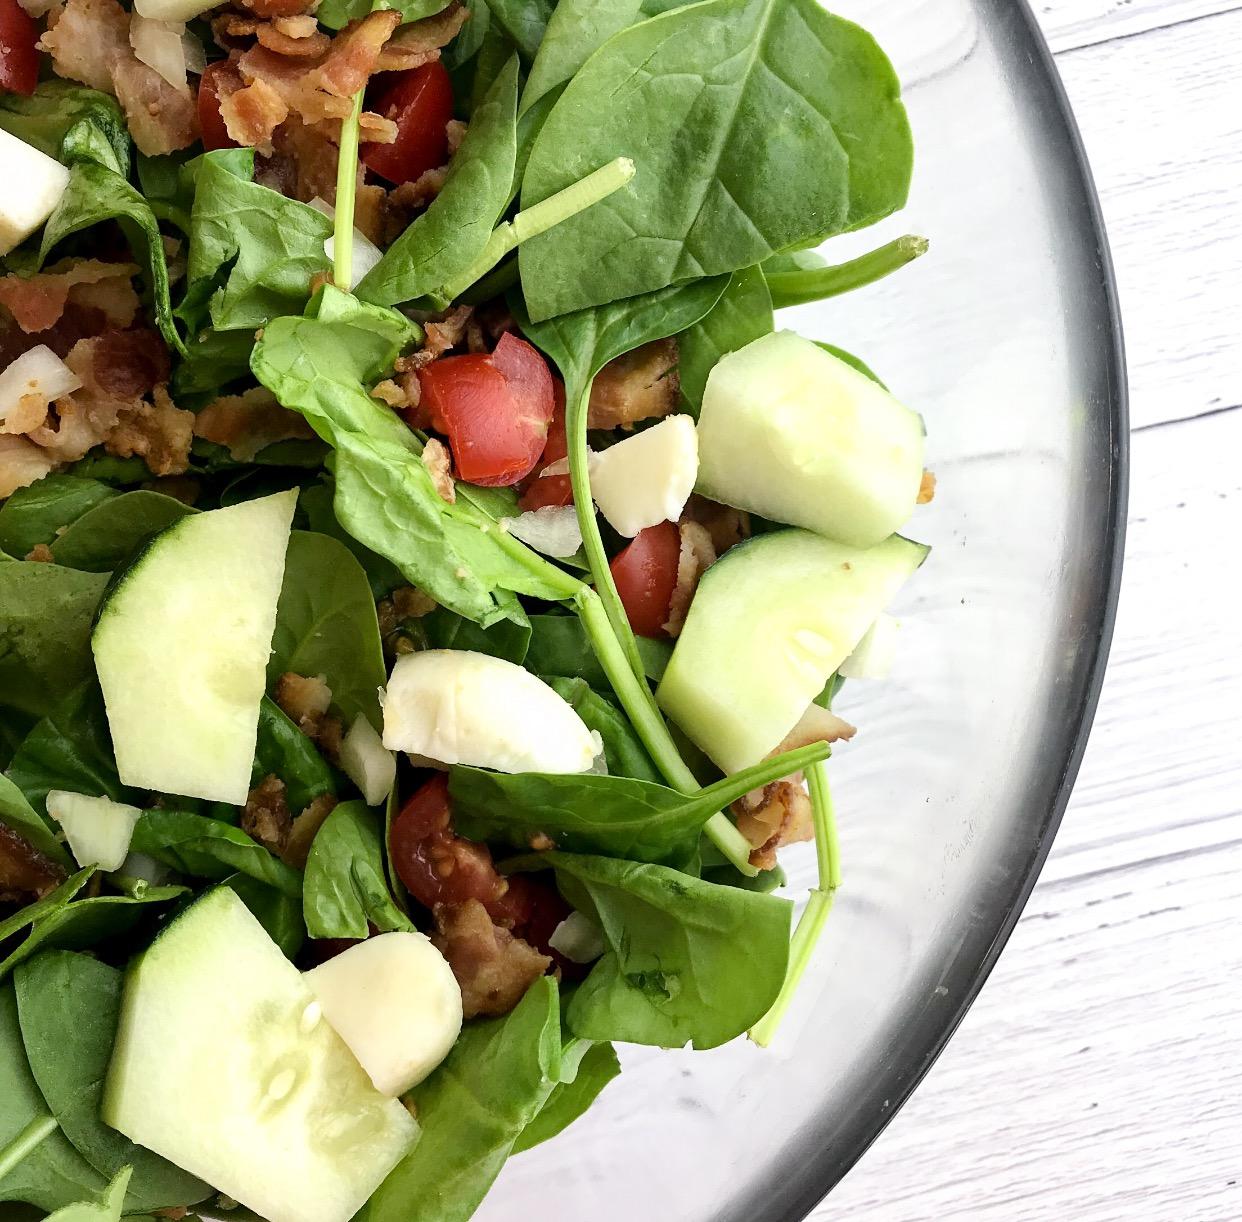 BLT Salad and Homemade Dressing!